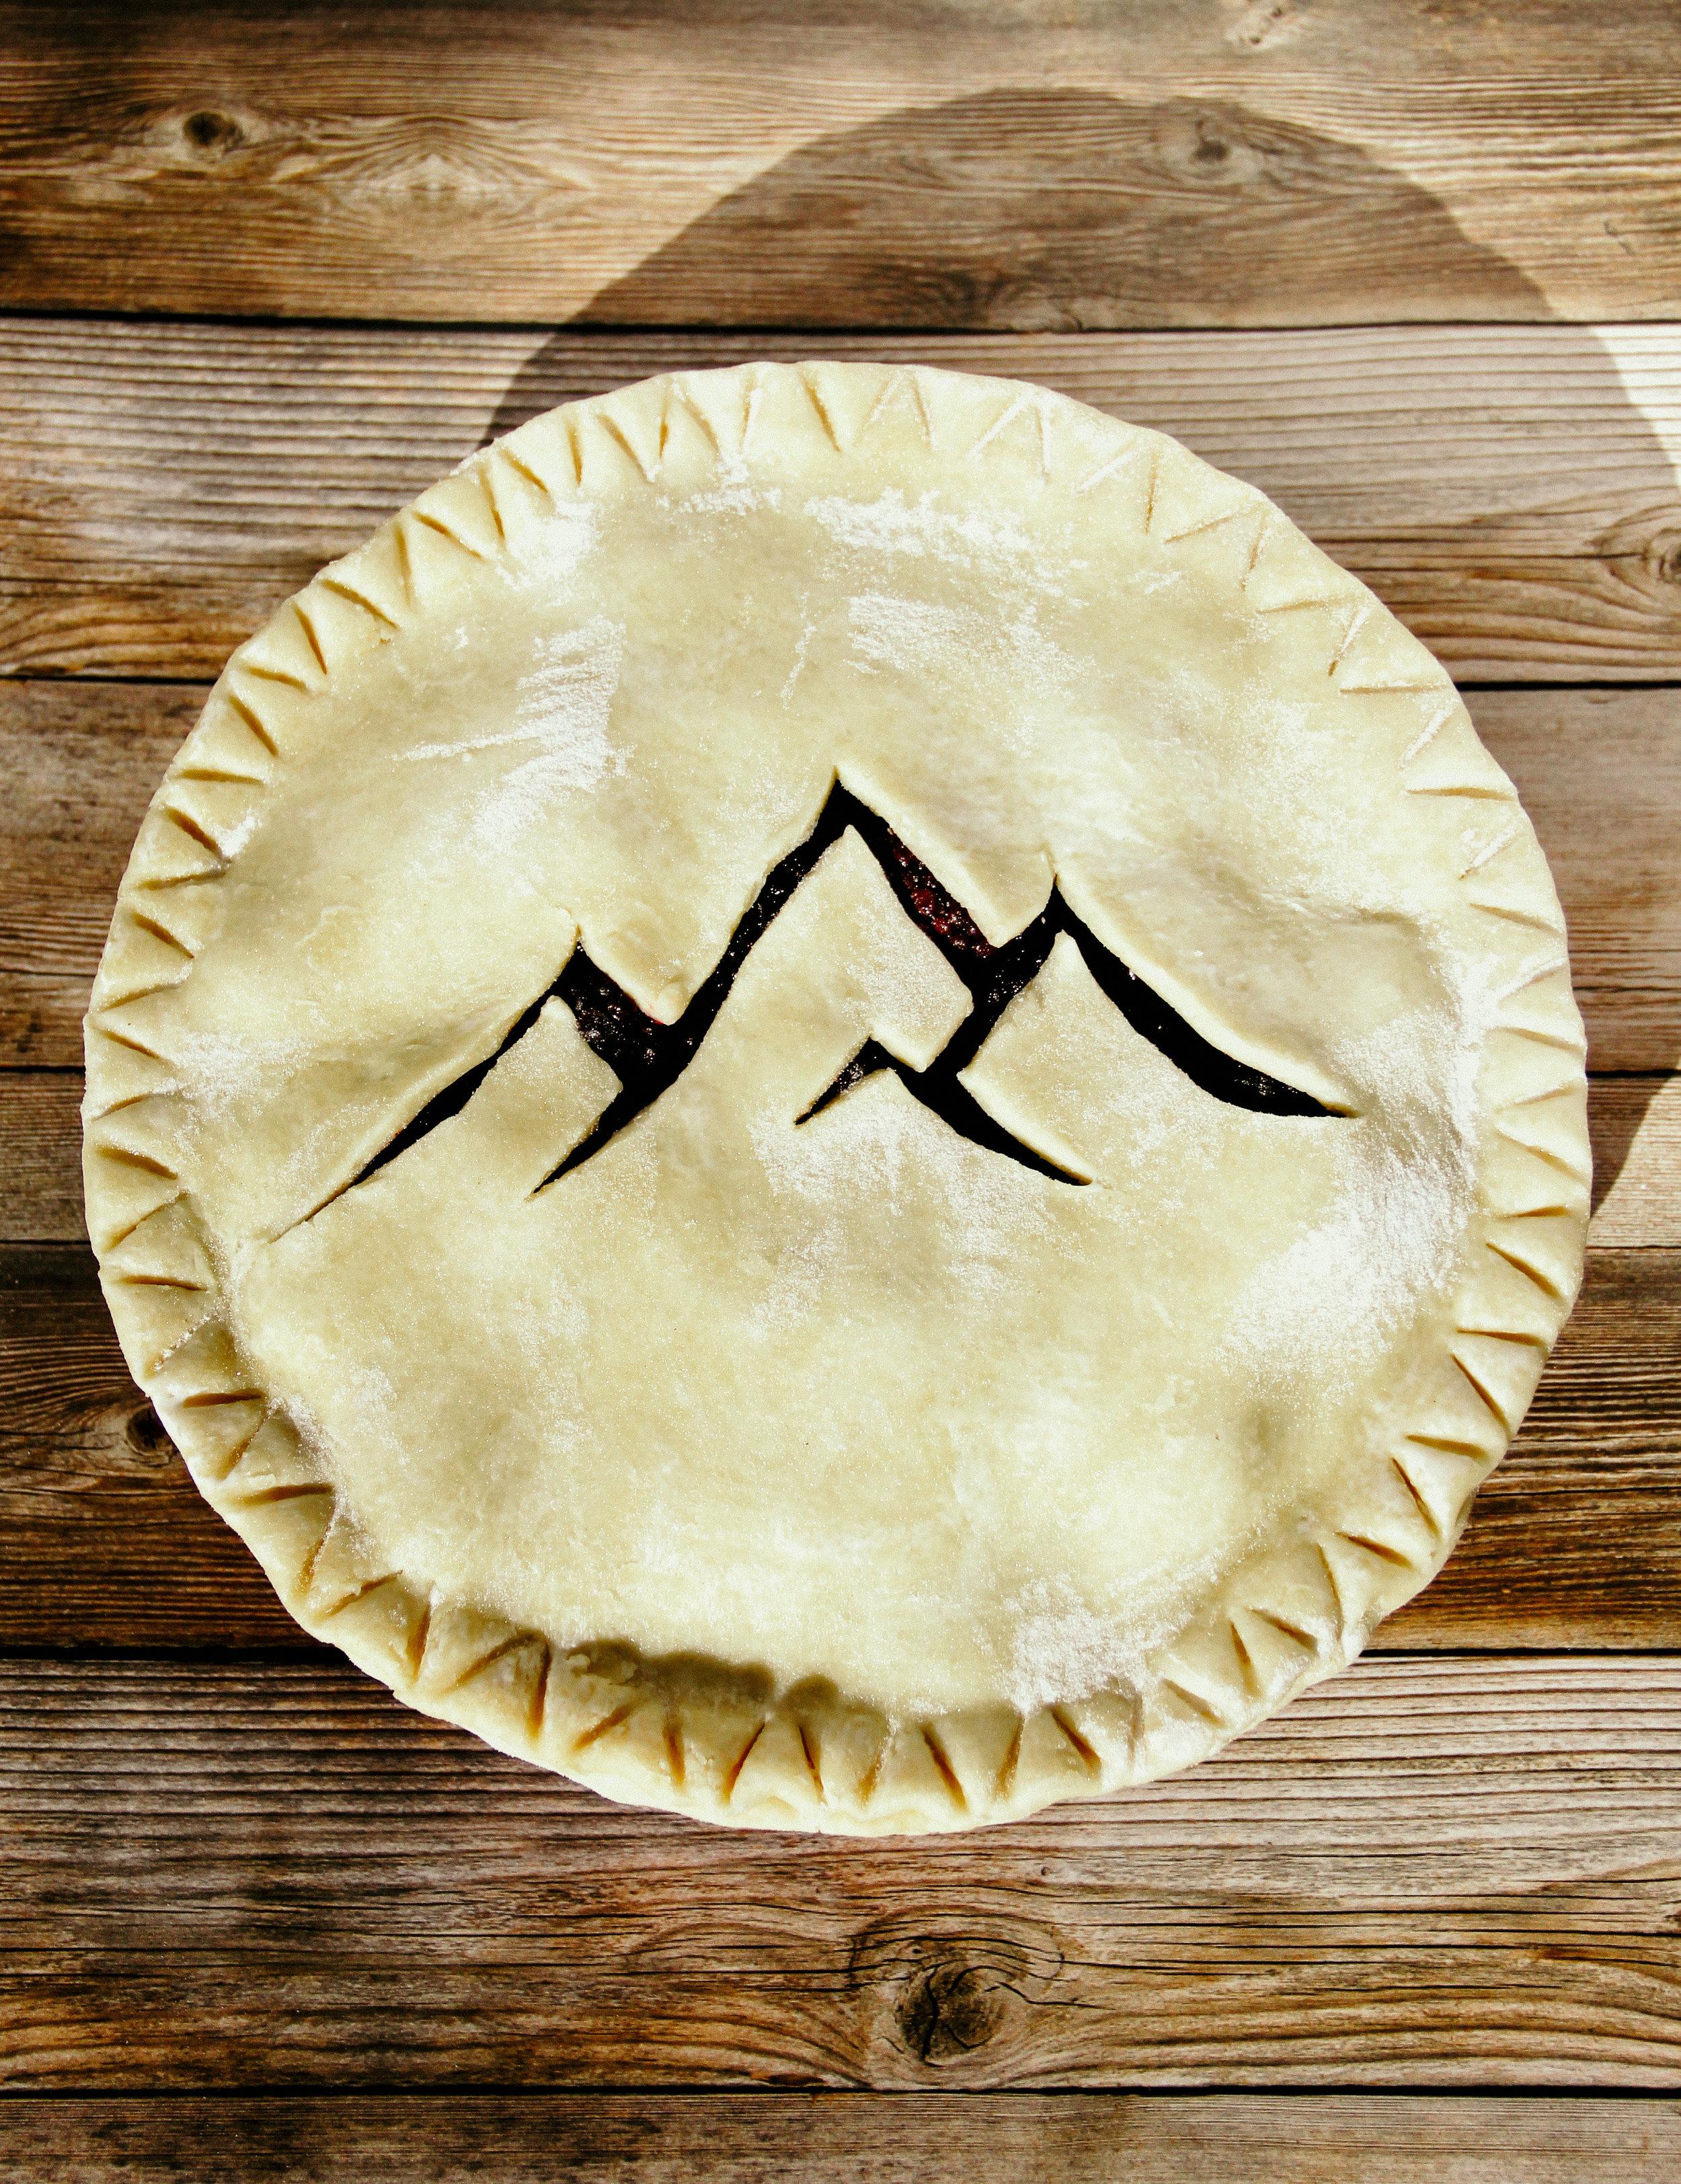 Mountain Scape Pie.jpg